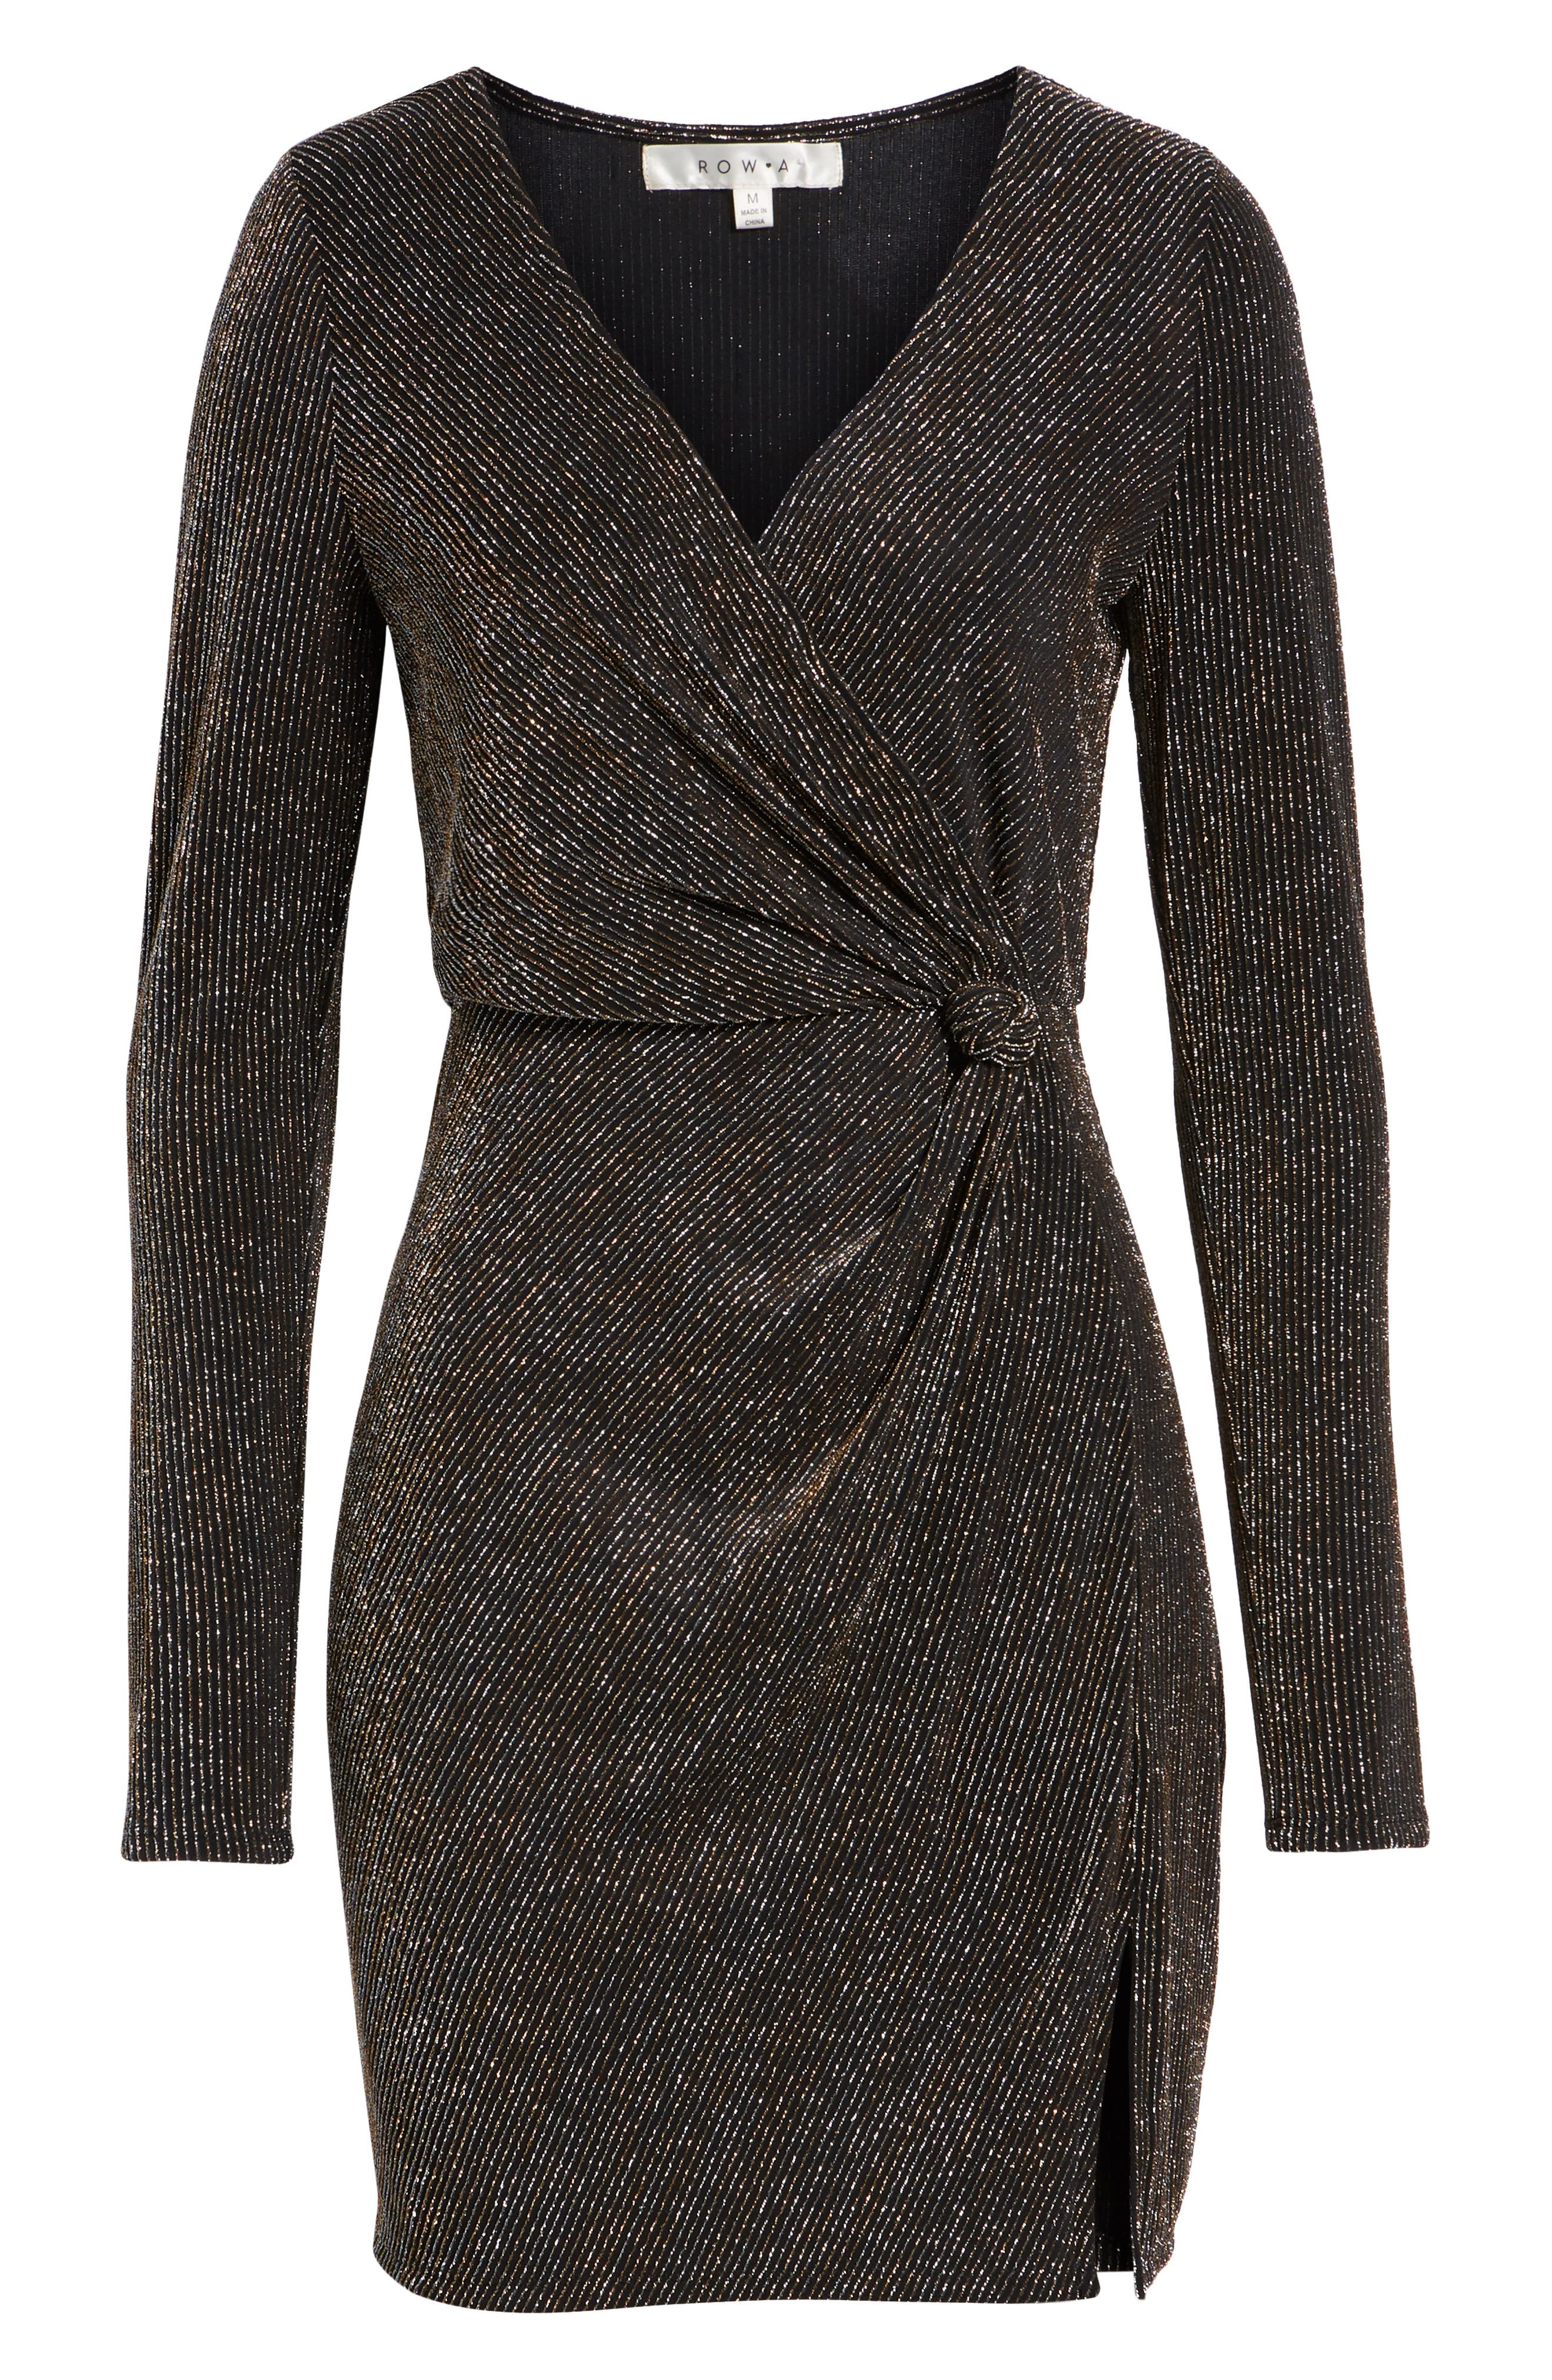 Metallic Sheath Dress,                             Alternate thumbnail 7, color,                             GOLD